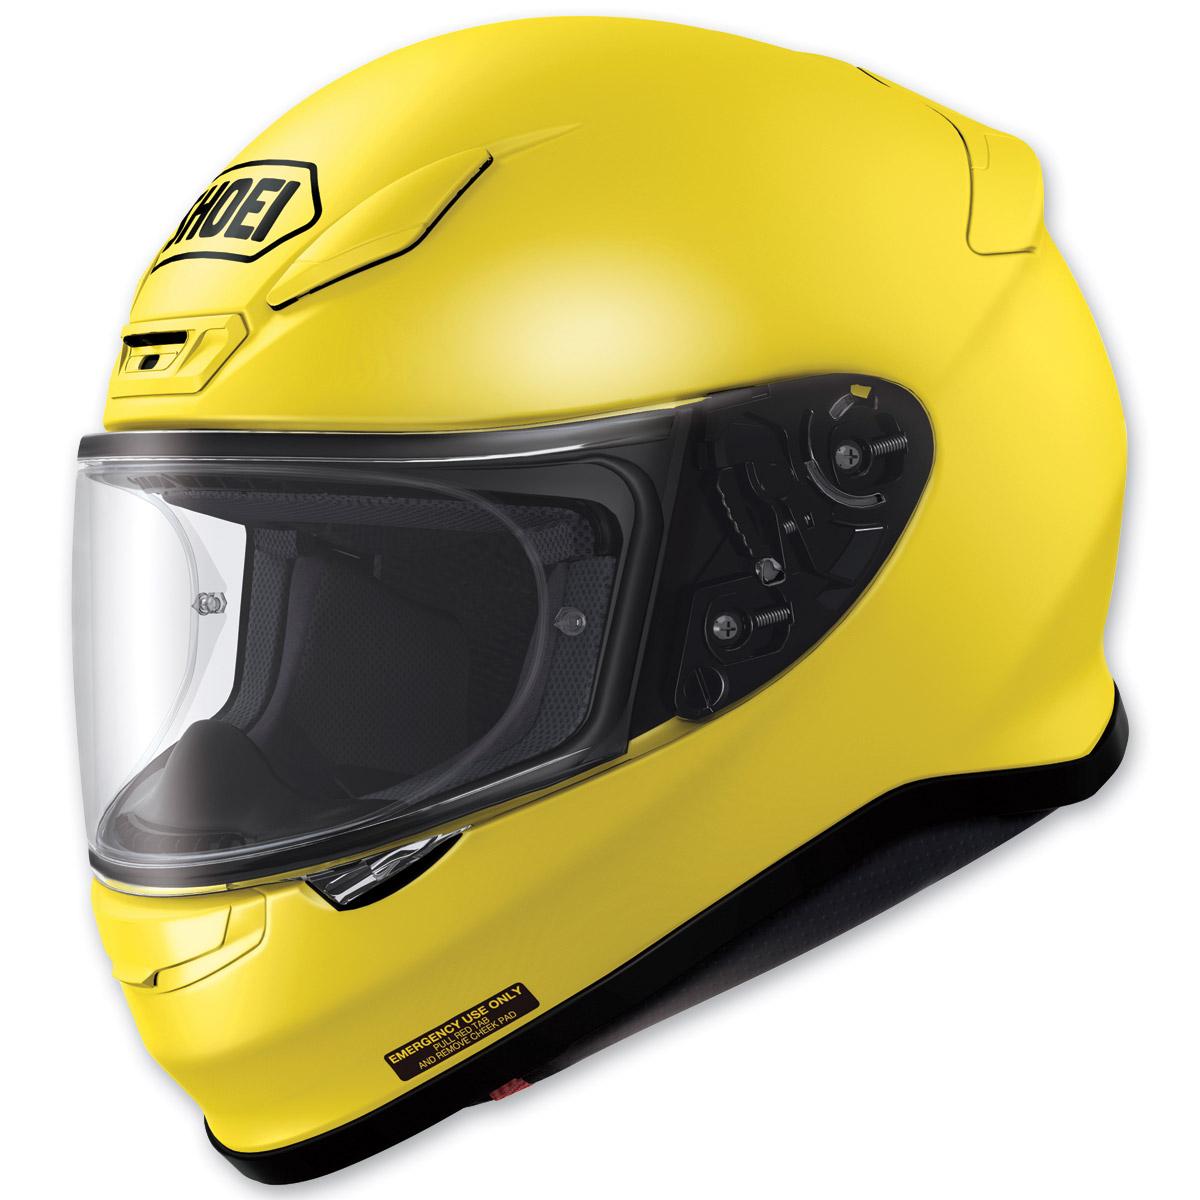 Shoei RF-1200 Brilliant Yellow Full Face Helmet